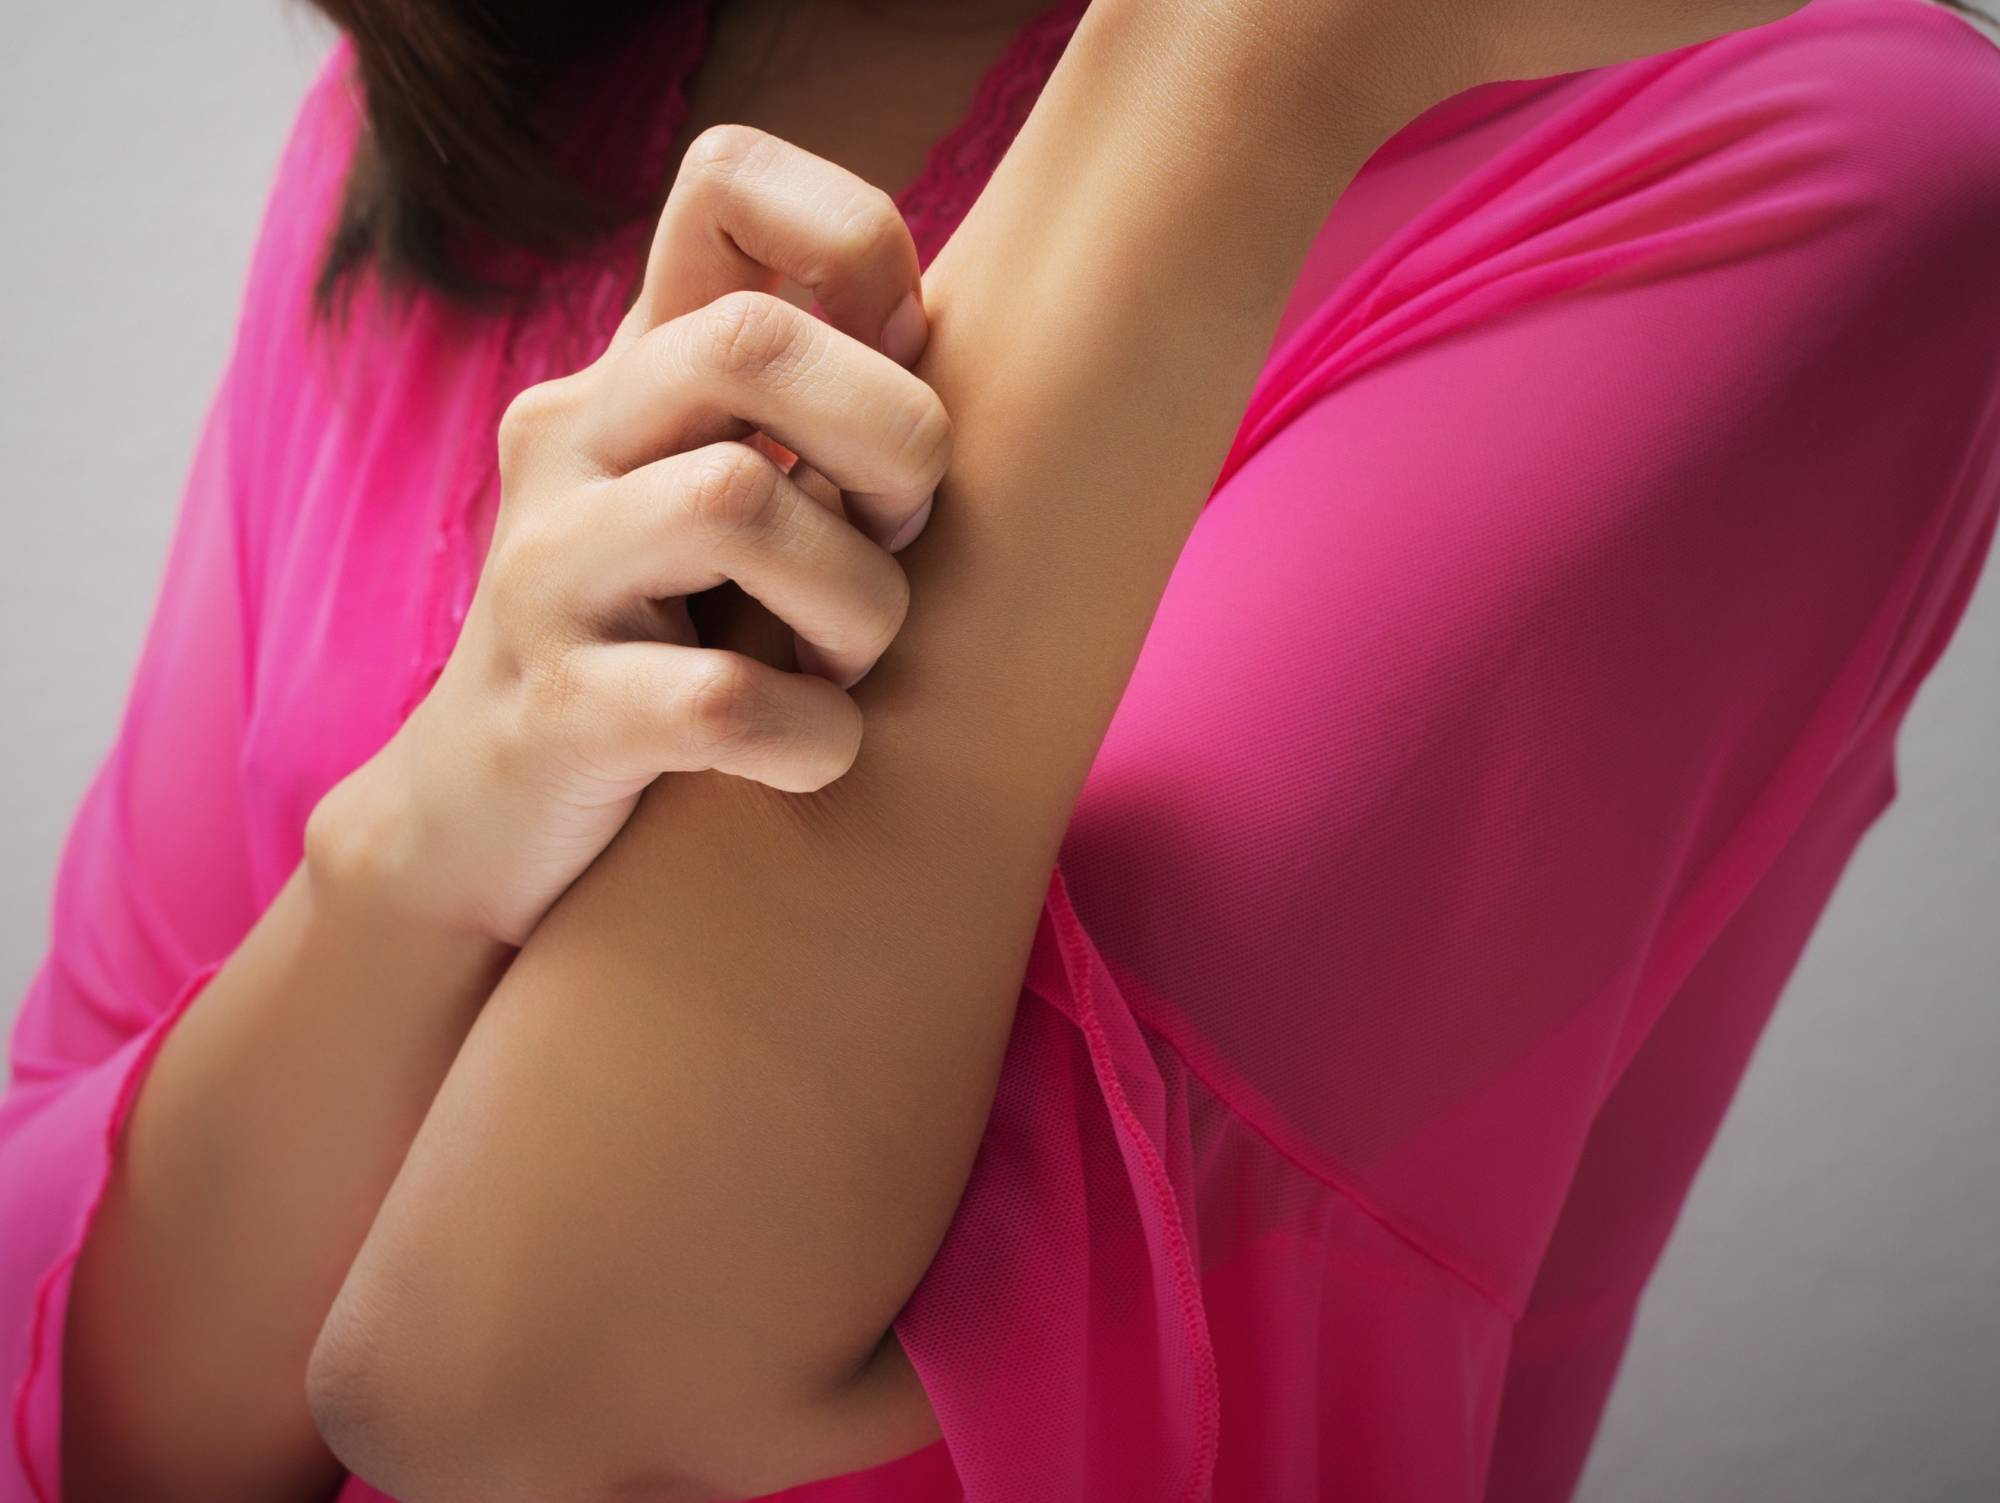 У девушки чешется рука от укуса мошки